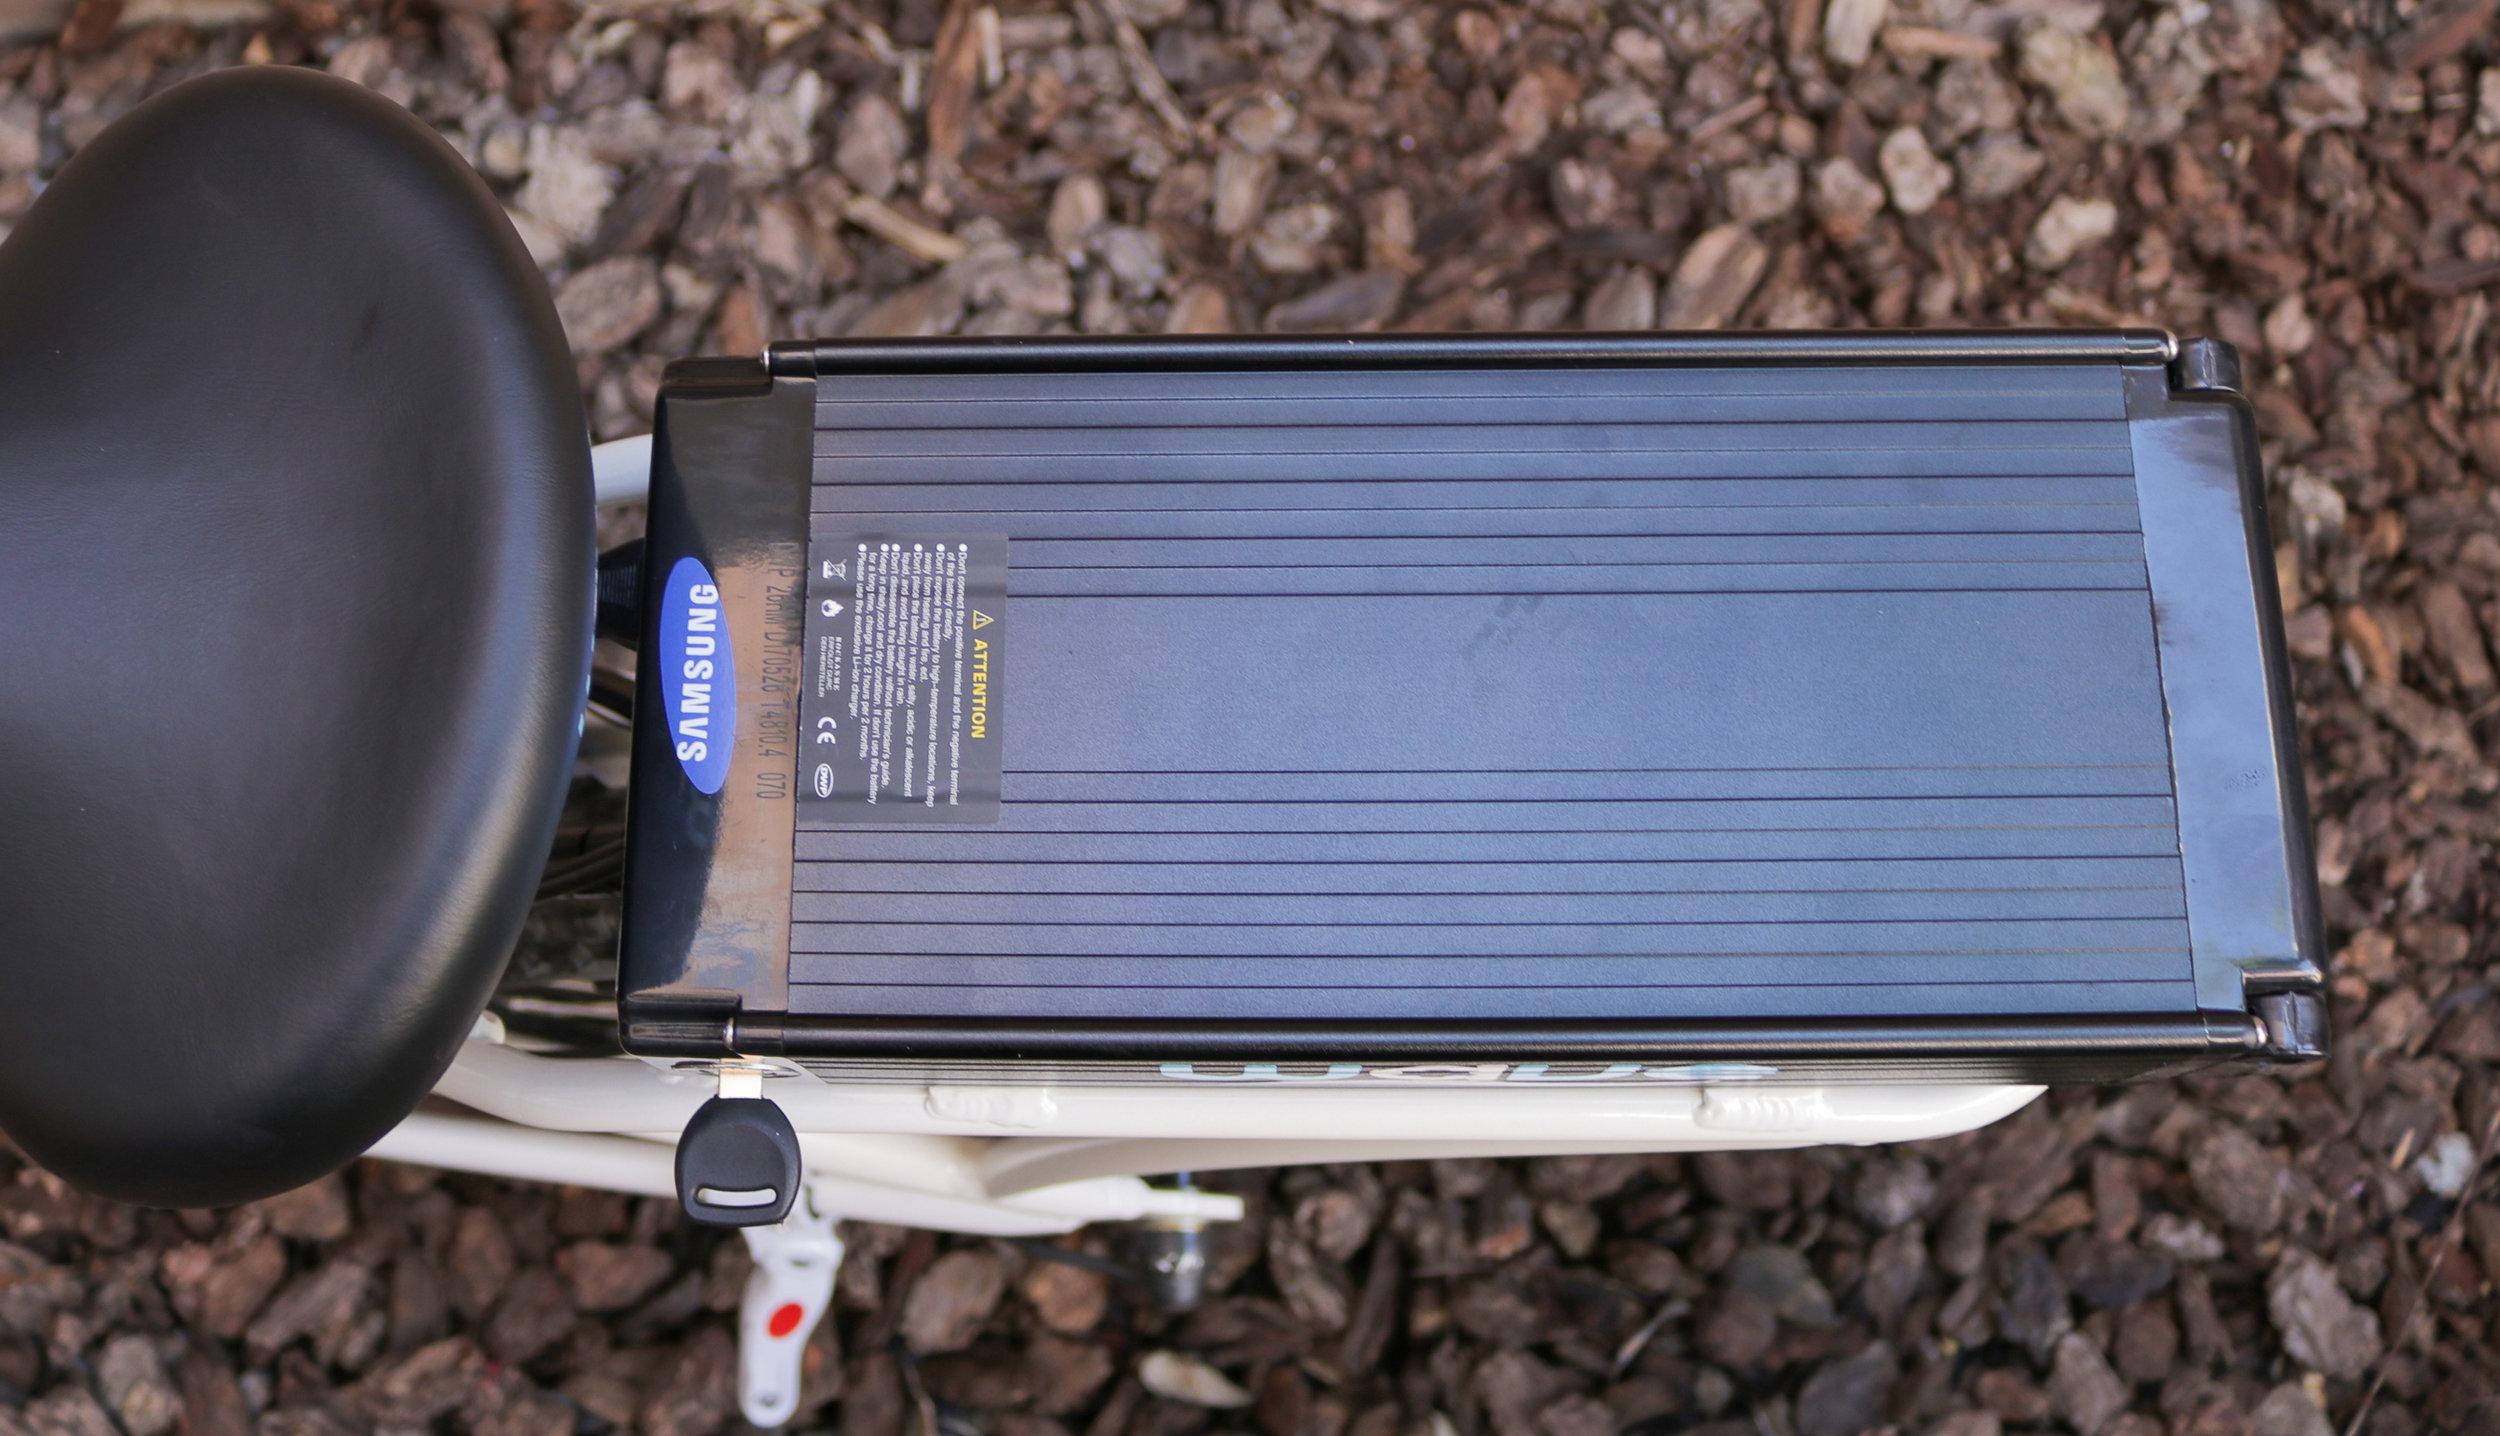 electrified-reviews-wave-electric-bike-review-battery-top-down.jpg